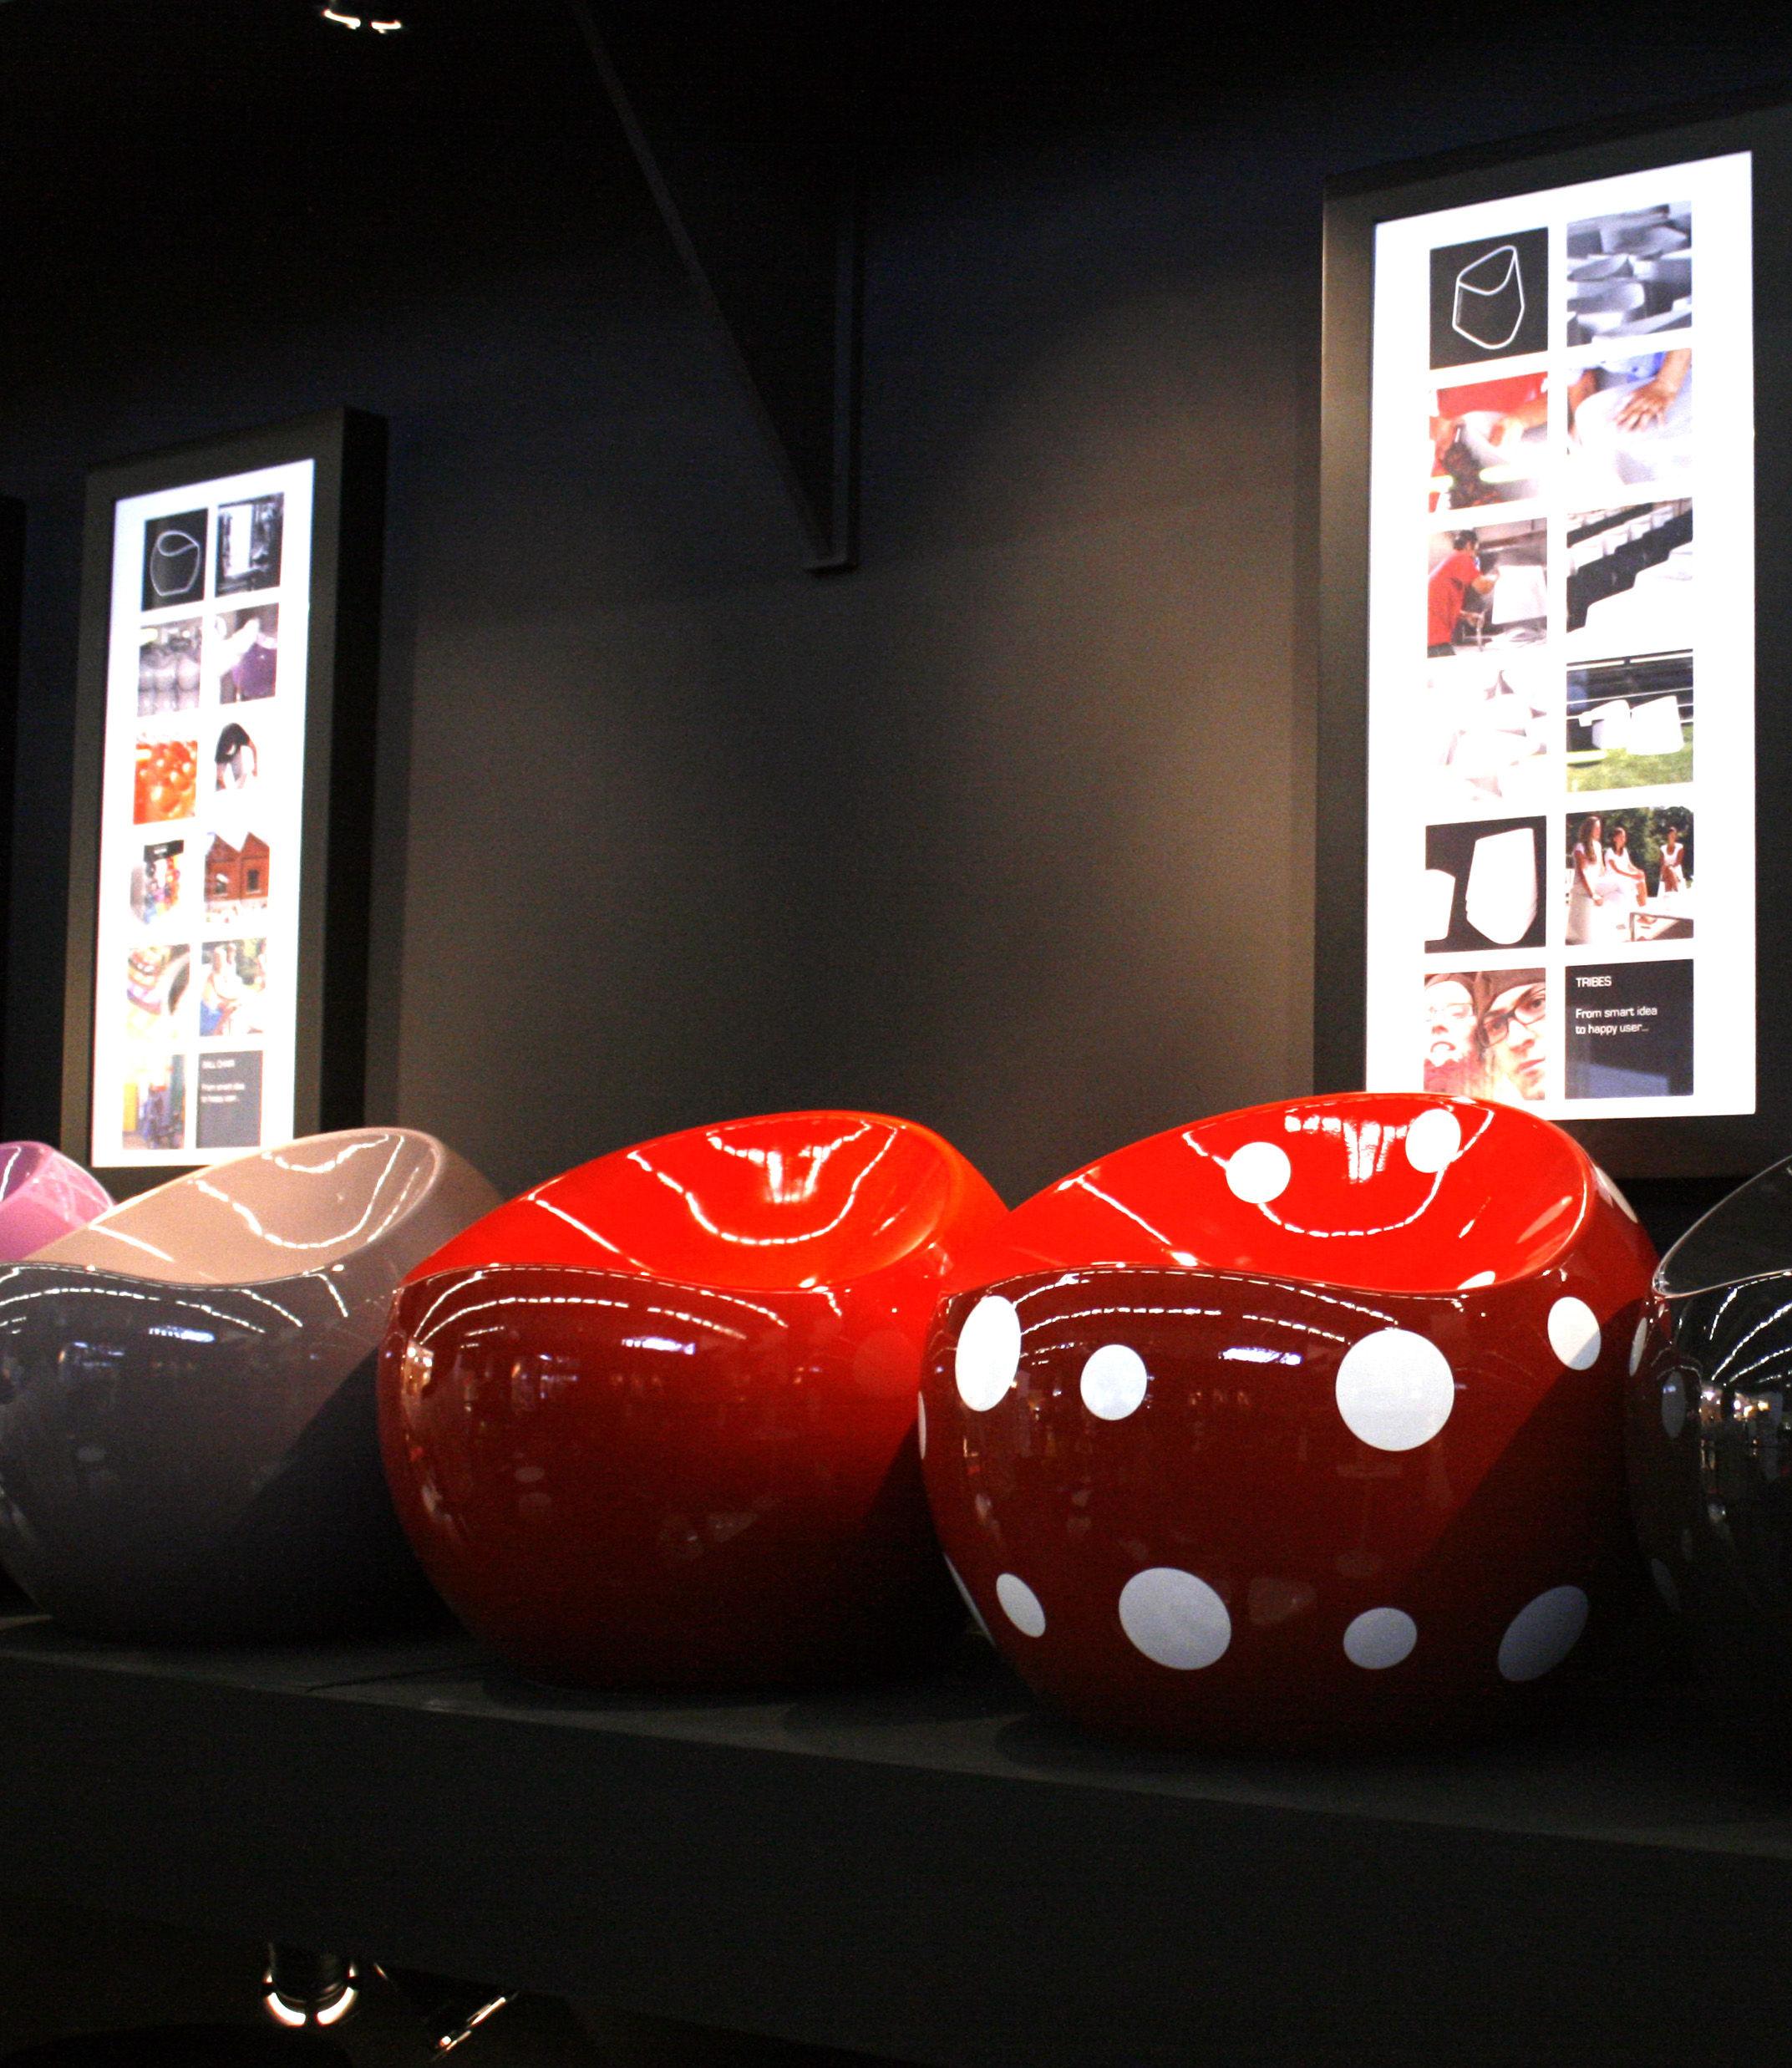 scopri pouf ball chair rosso a pois bianchi di xl boom. Black Bedroom Furniture Sets. Home Design Ideas